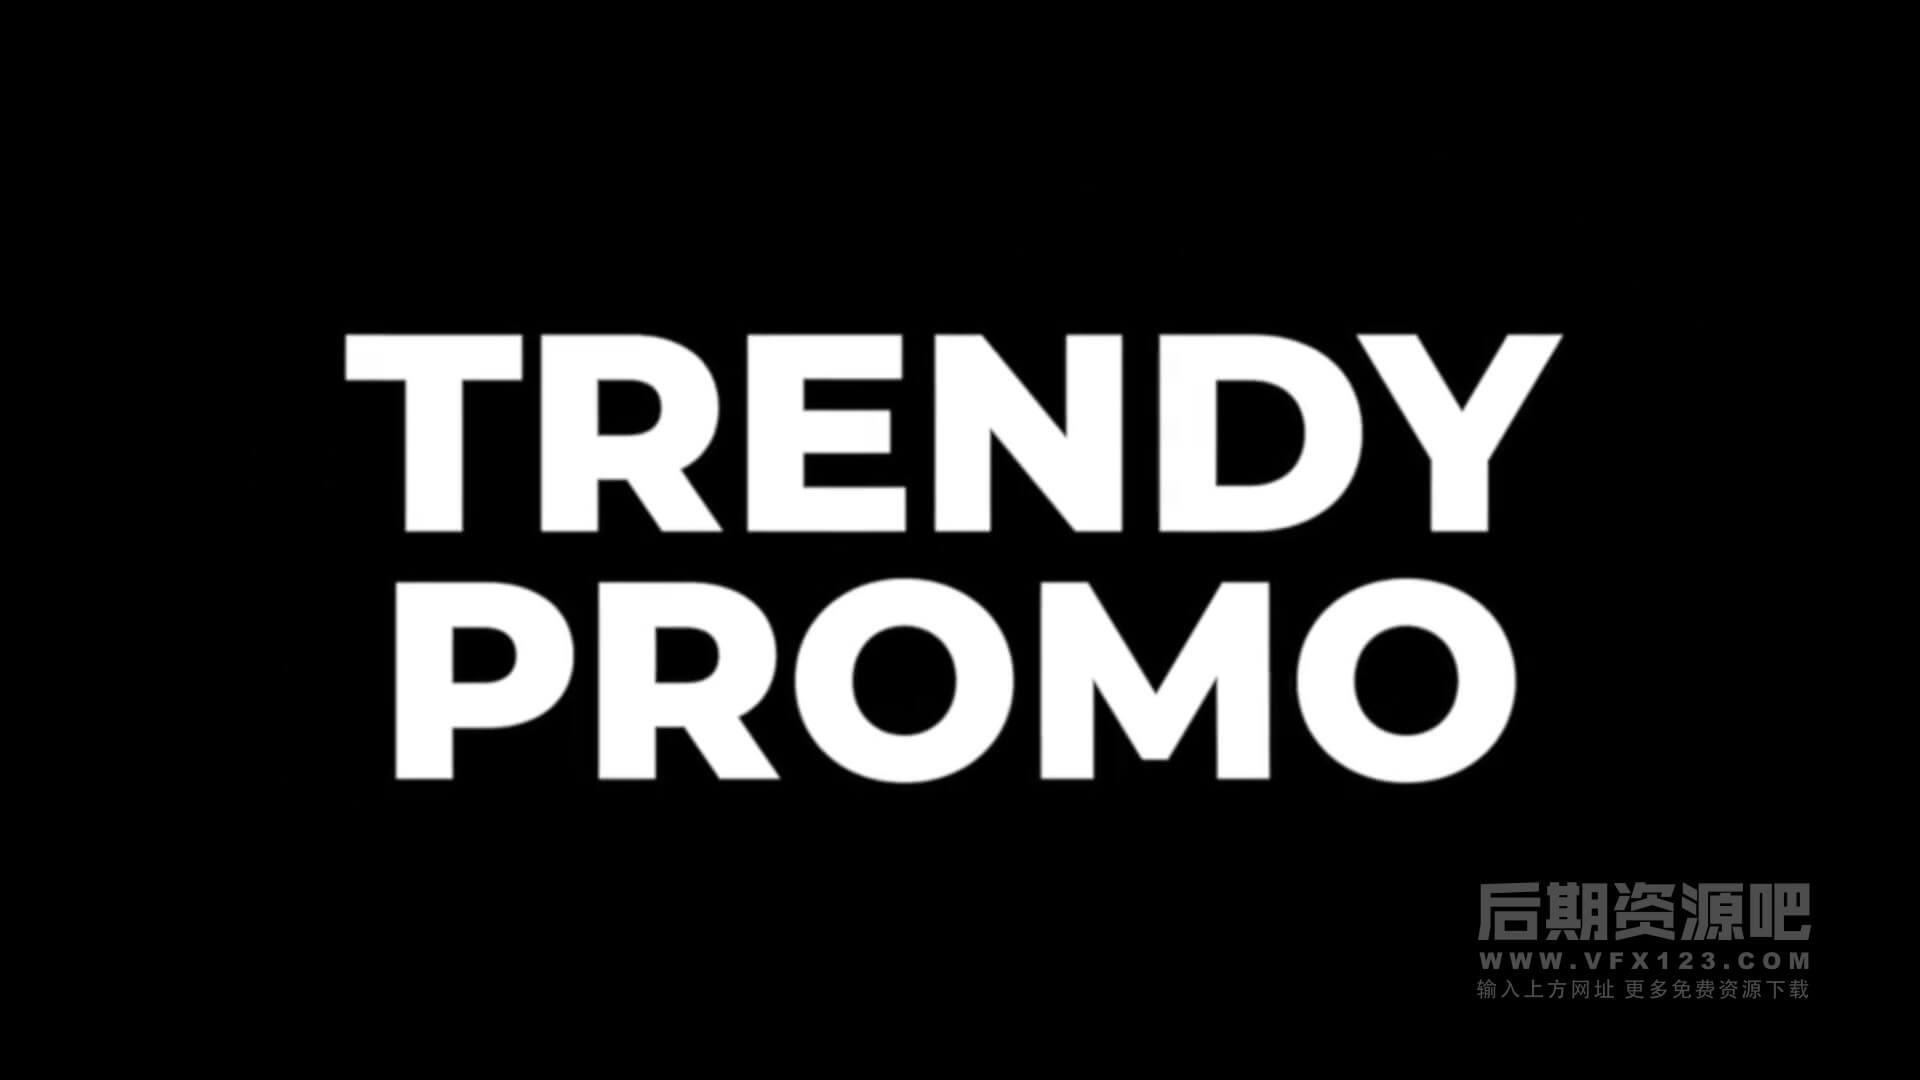 Fcpx插件 快速动感大字标题模板 Trendy Fast Promo